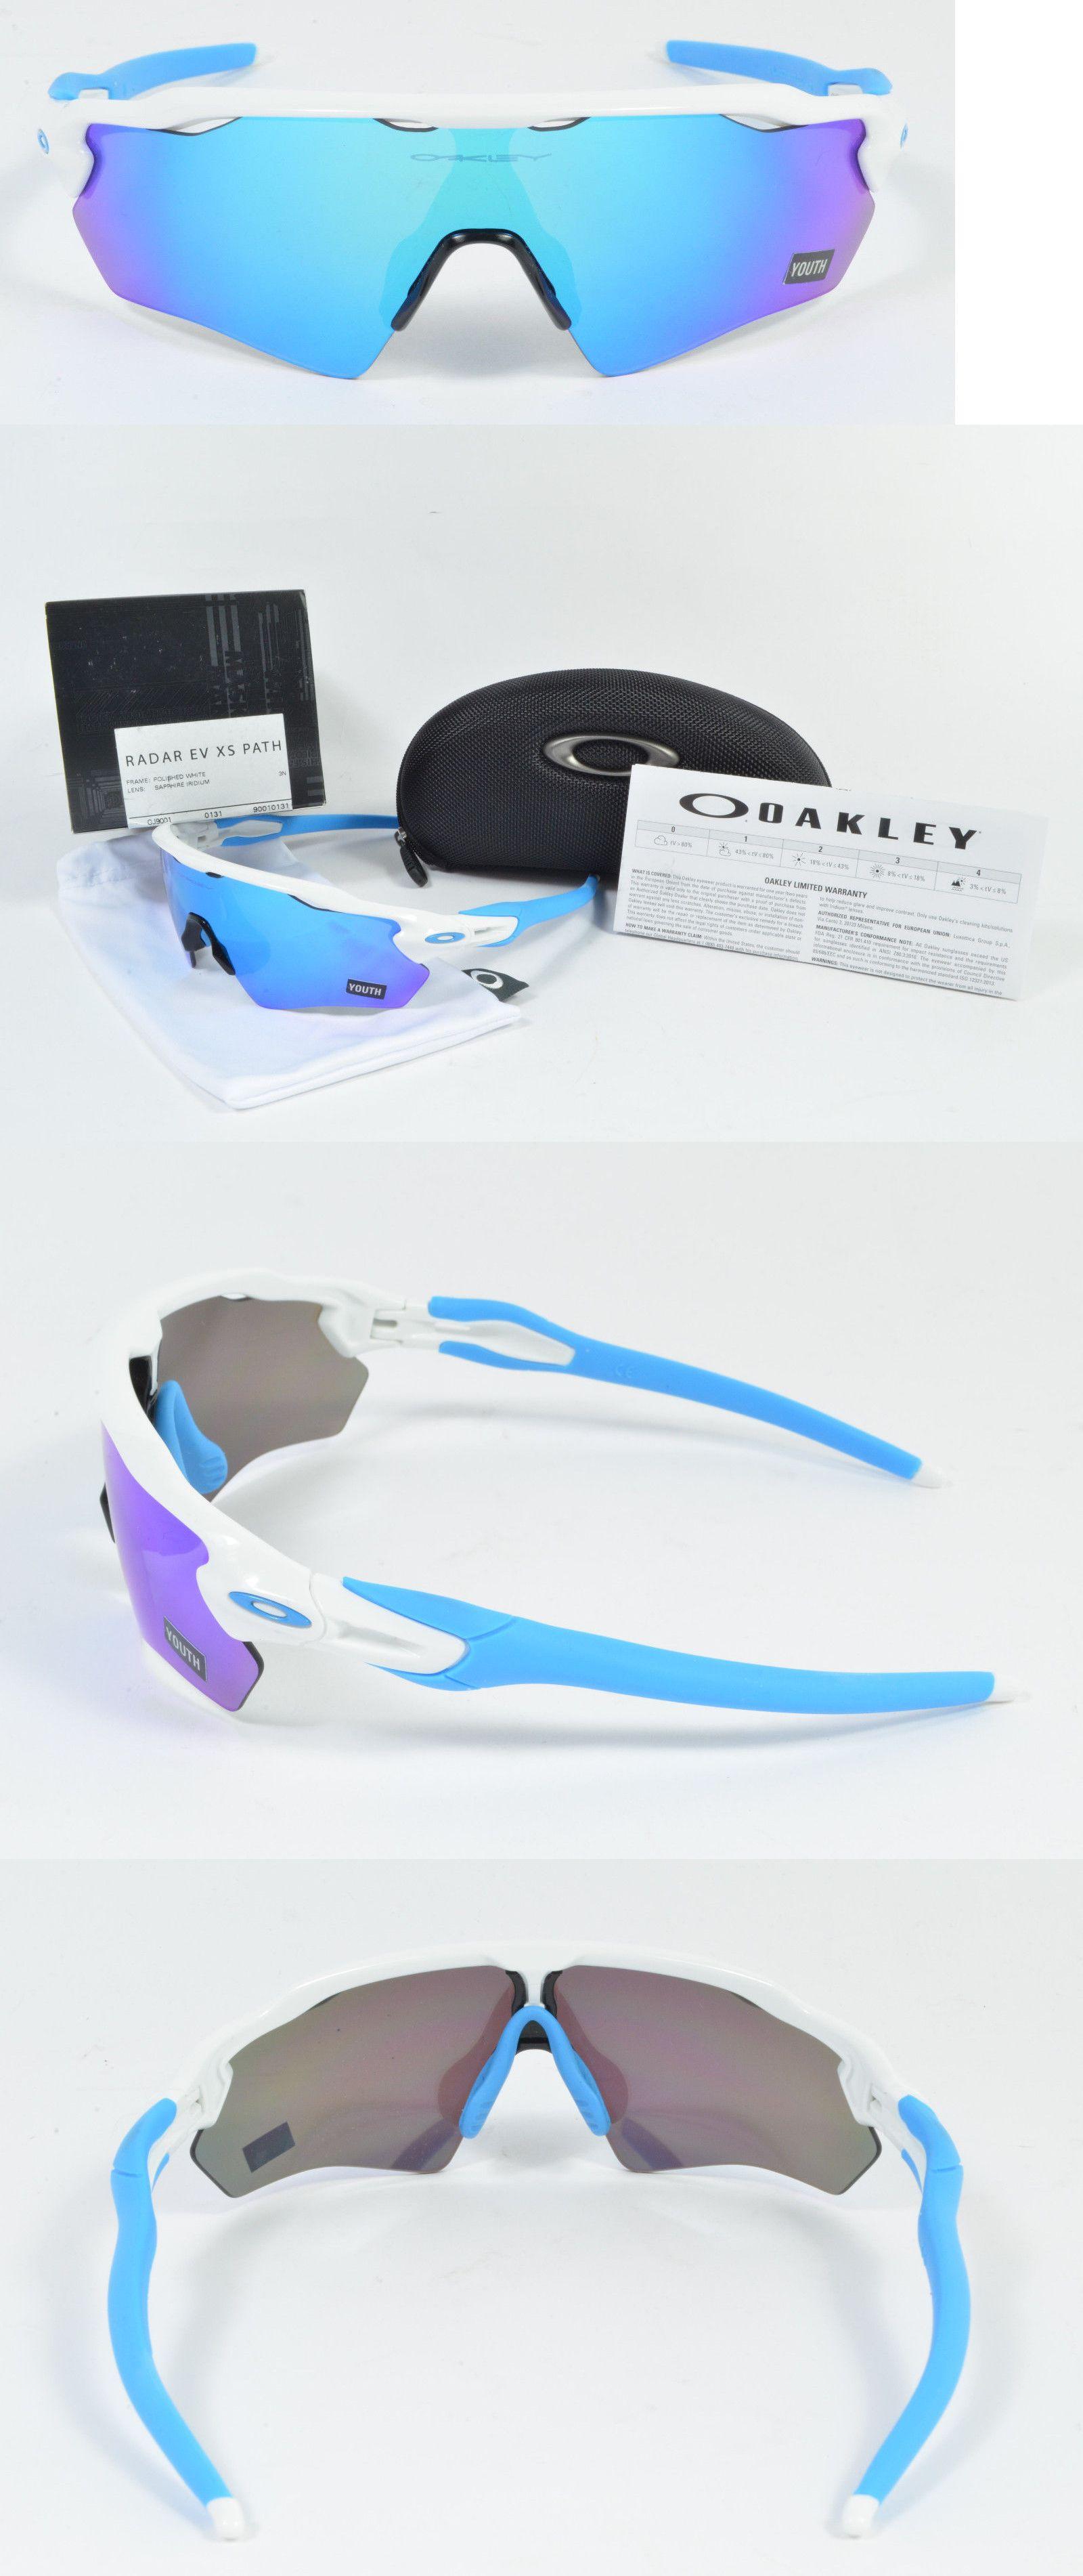 234227187fd25 ... where can i buy sunglasses 131411 oakley radar ev xs path youth  polished white w sapphire